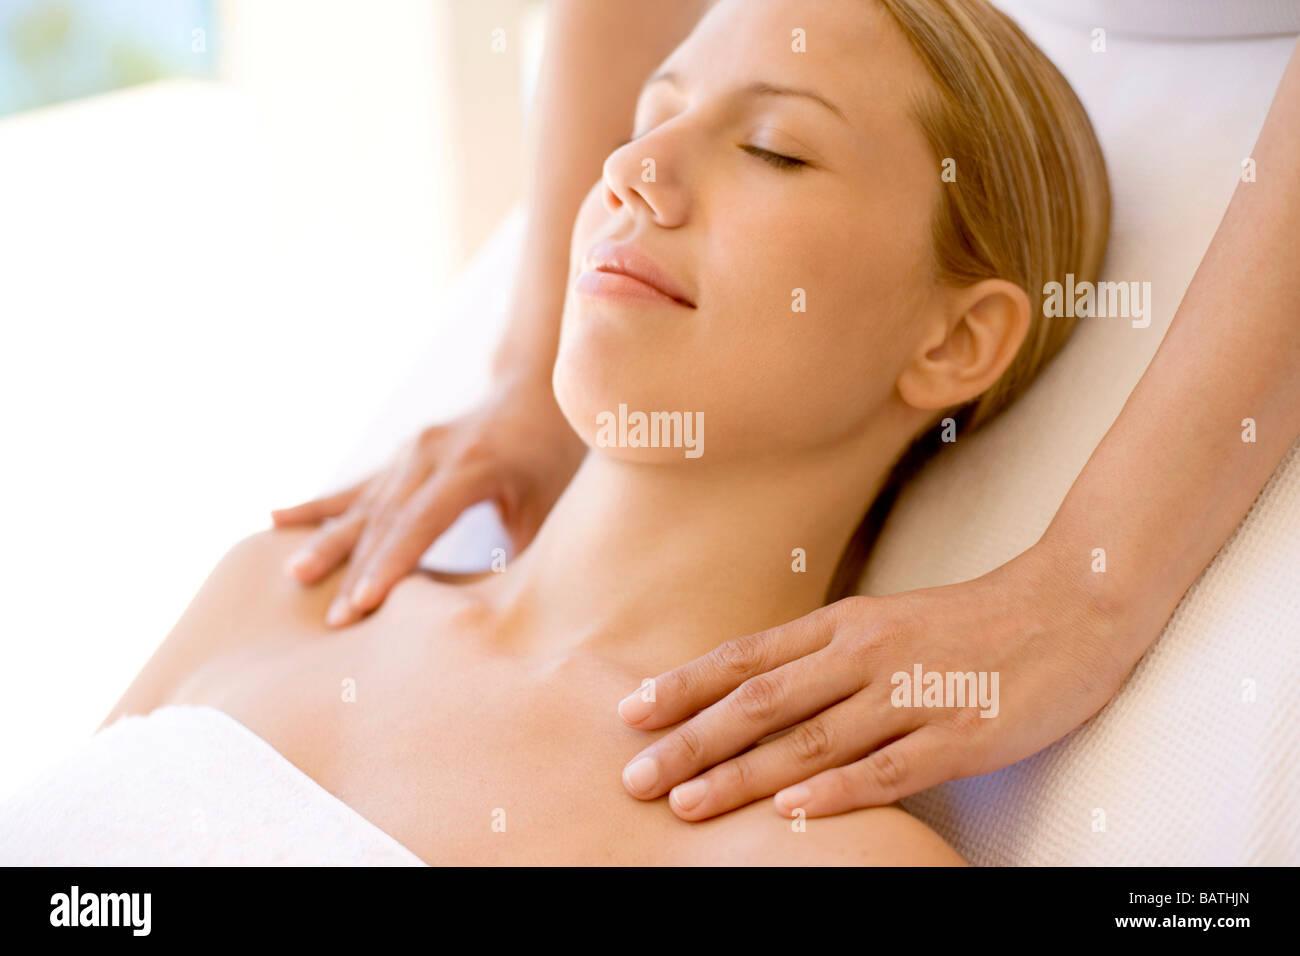 Massage. Woman receiving a temple massage. Stock Photo